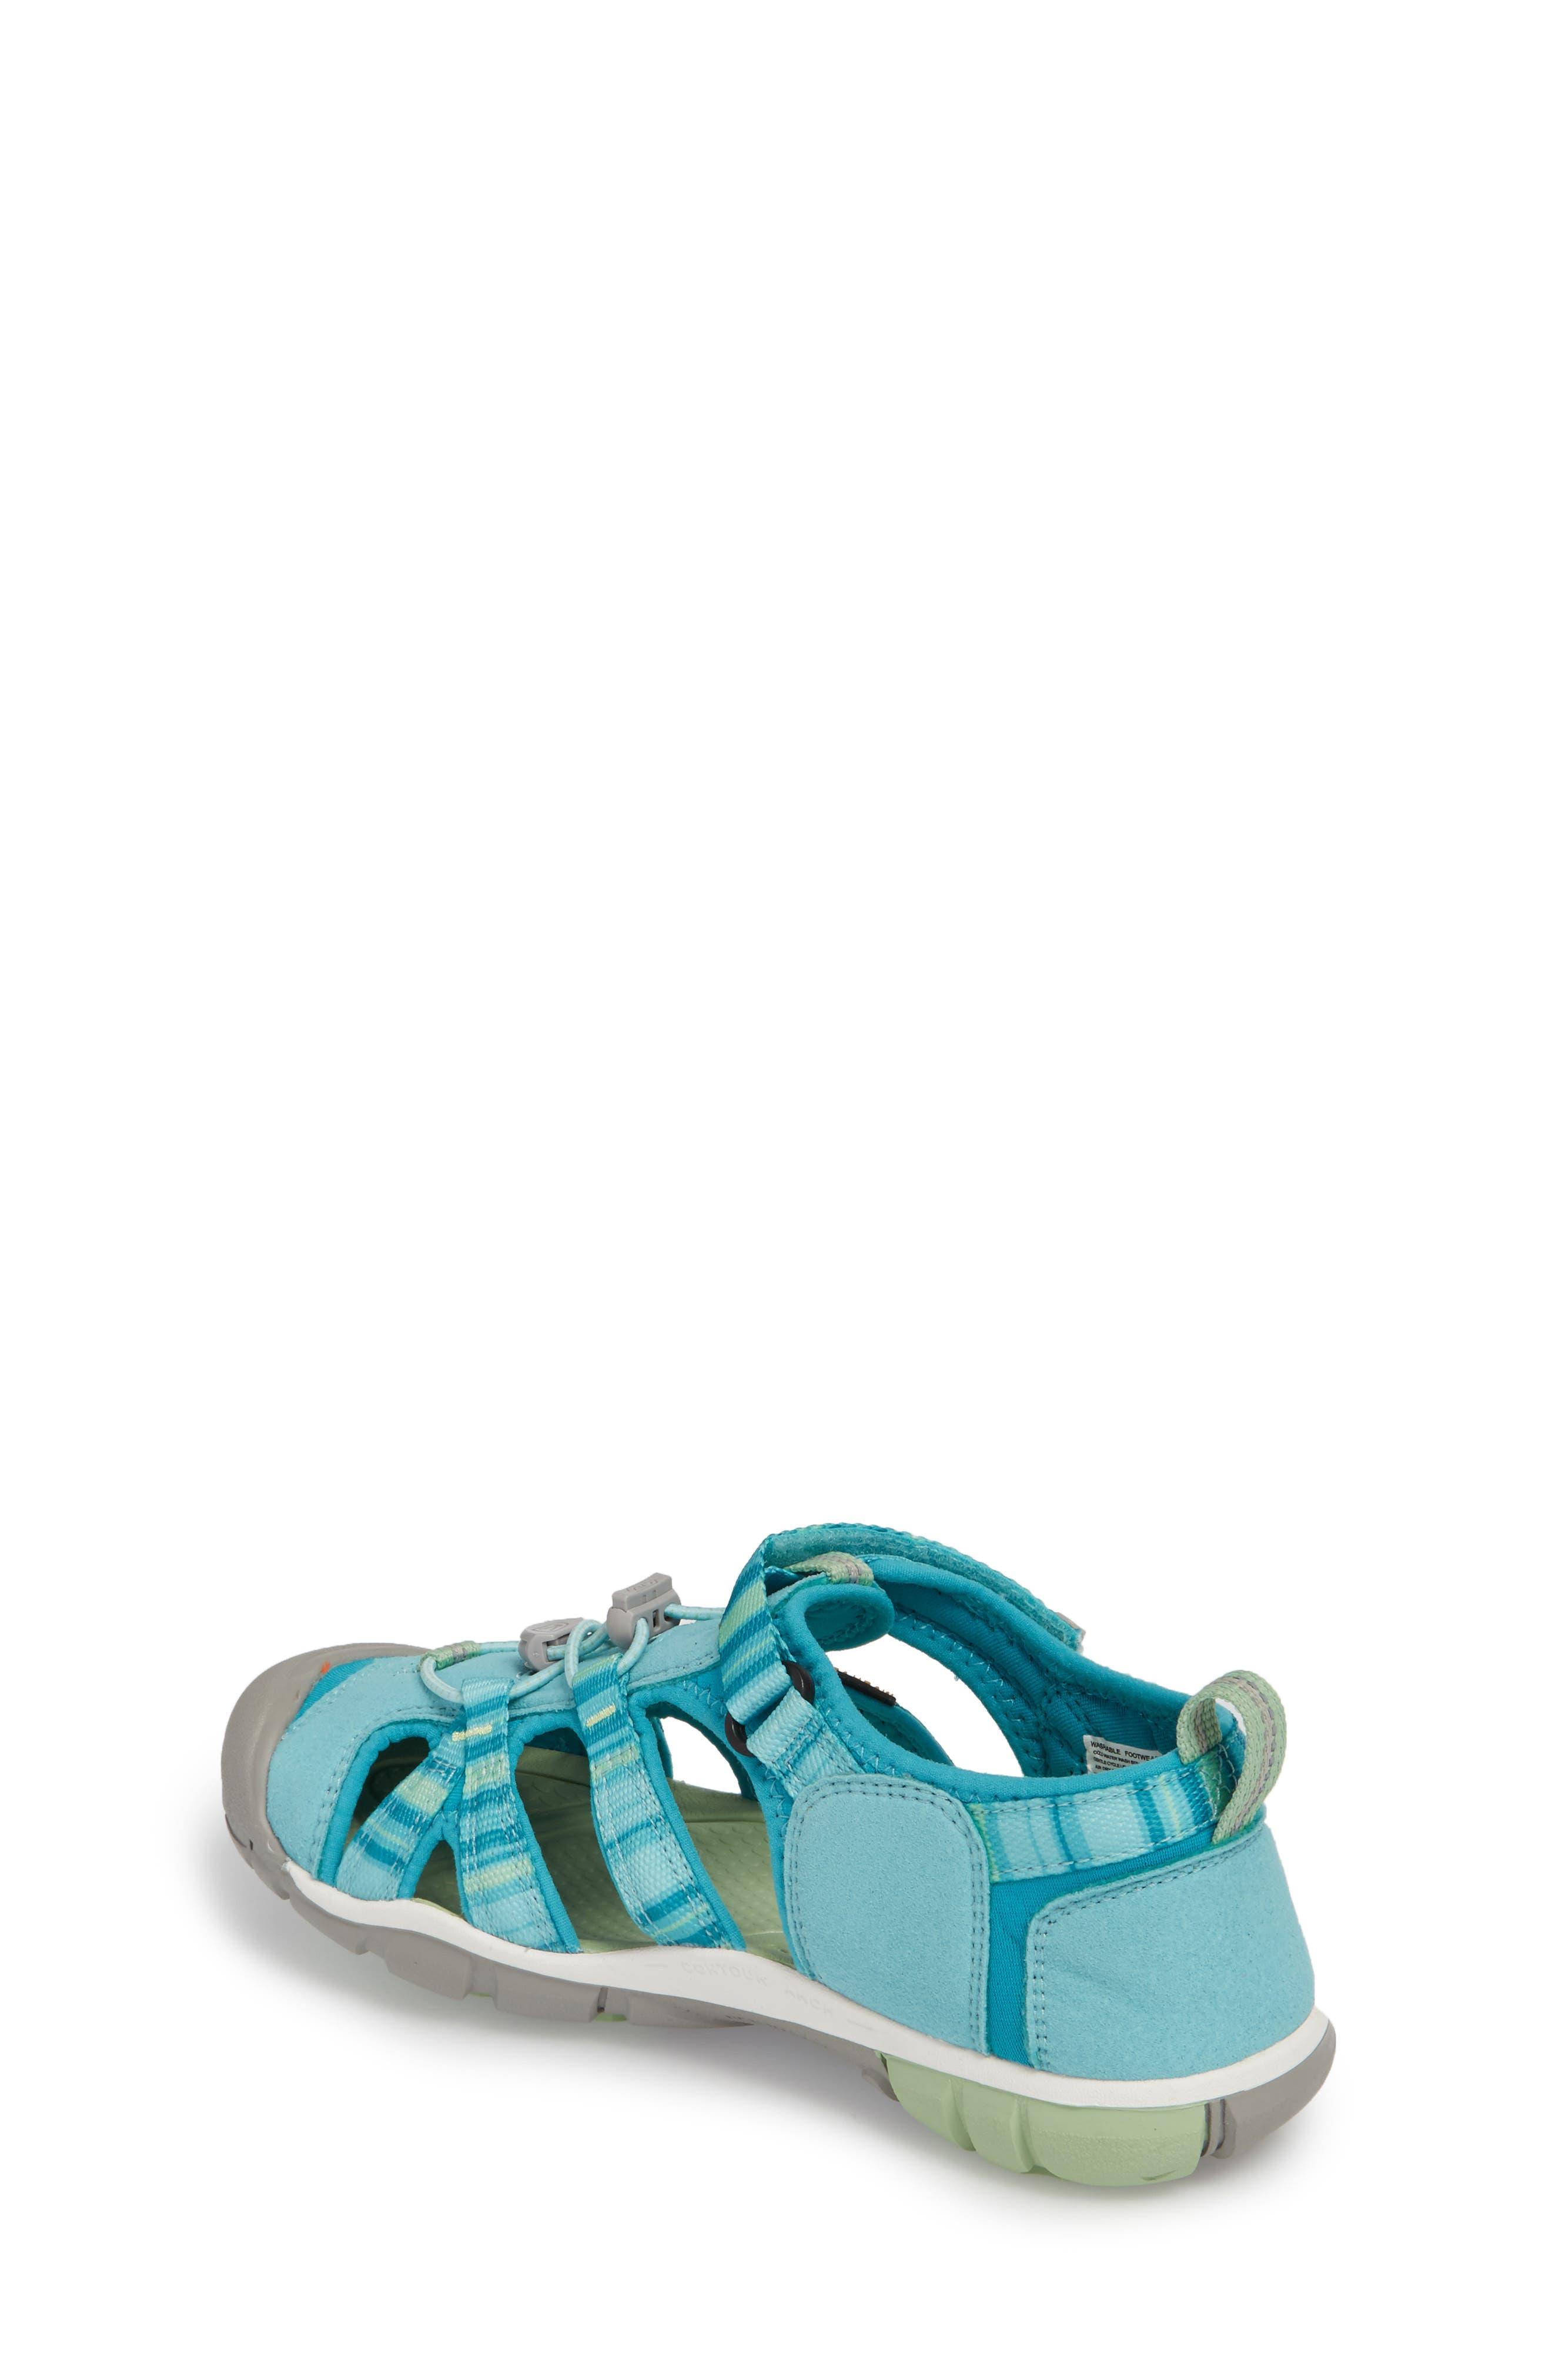 ,                             'Seacamp II' Water Friendly Sandal,                             Alternate thumbnail 169, color,                             406